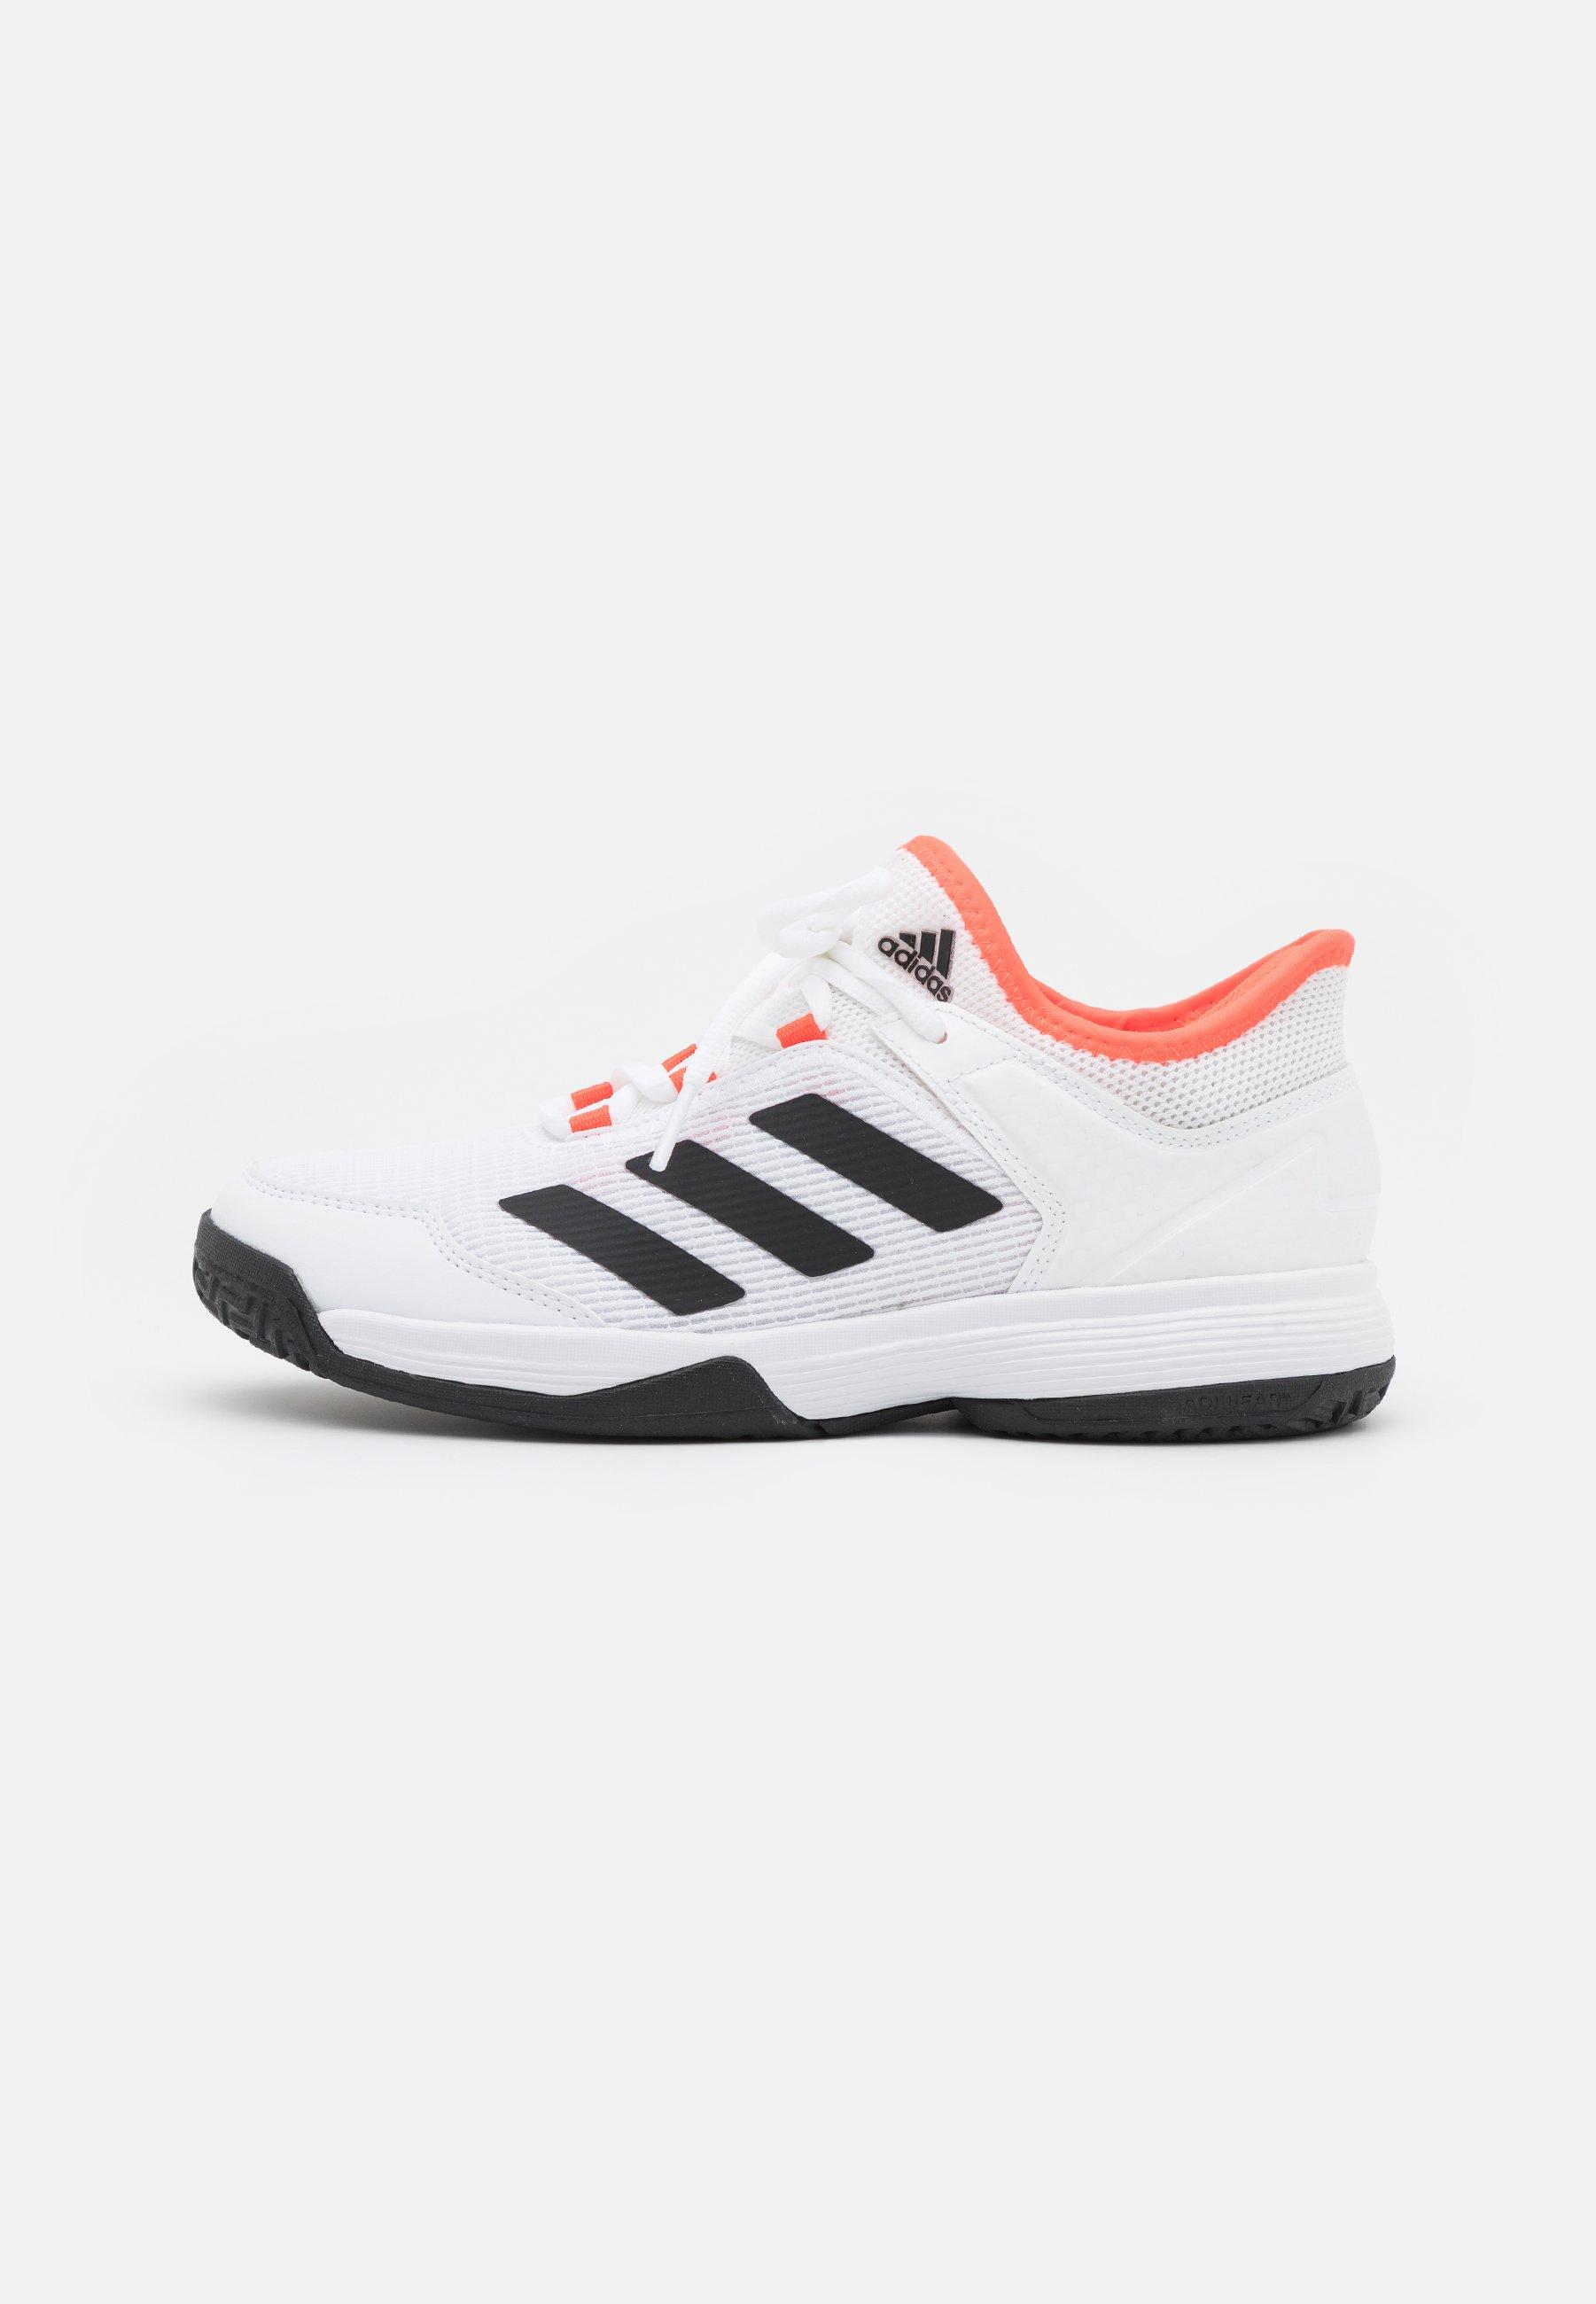 Kids UBERSONIC 4 UNISEX - Multicourt tennis shoes